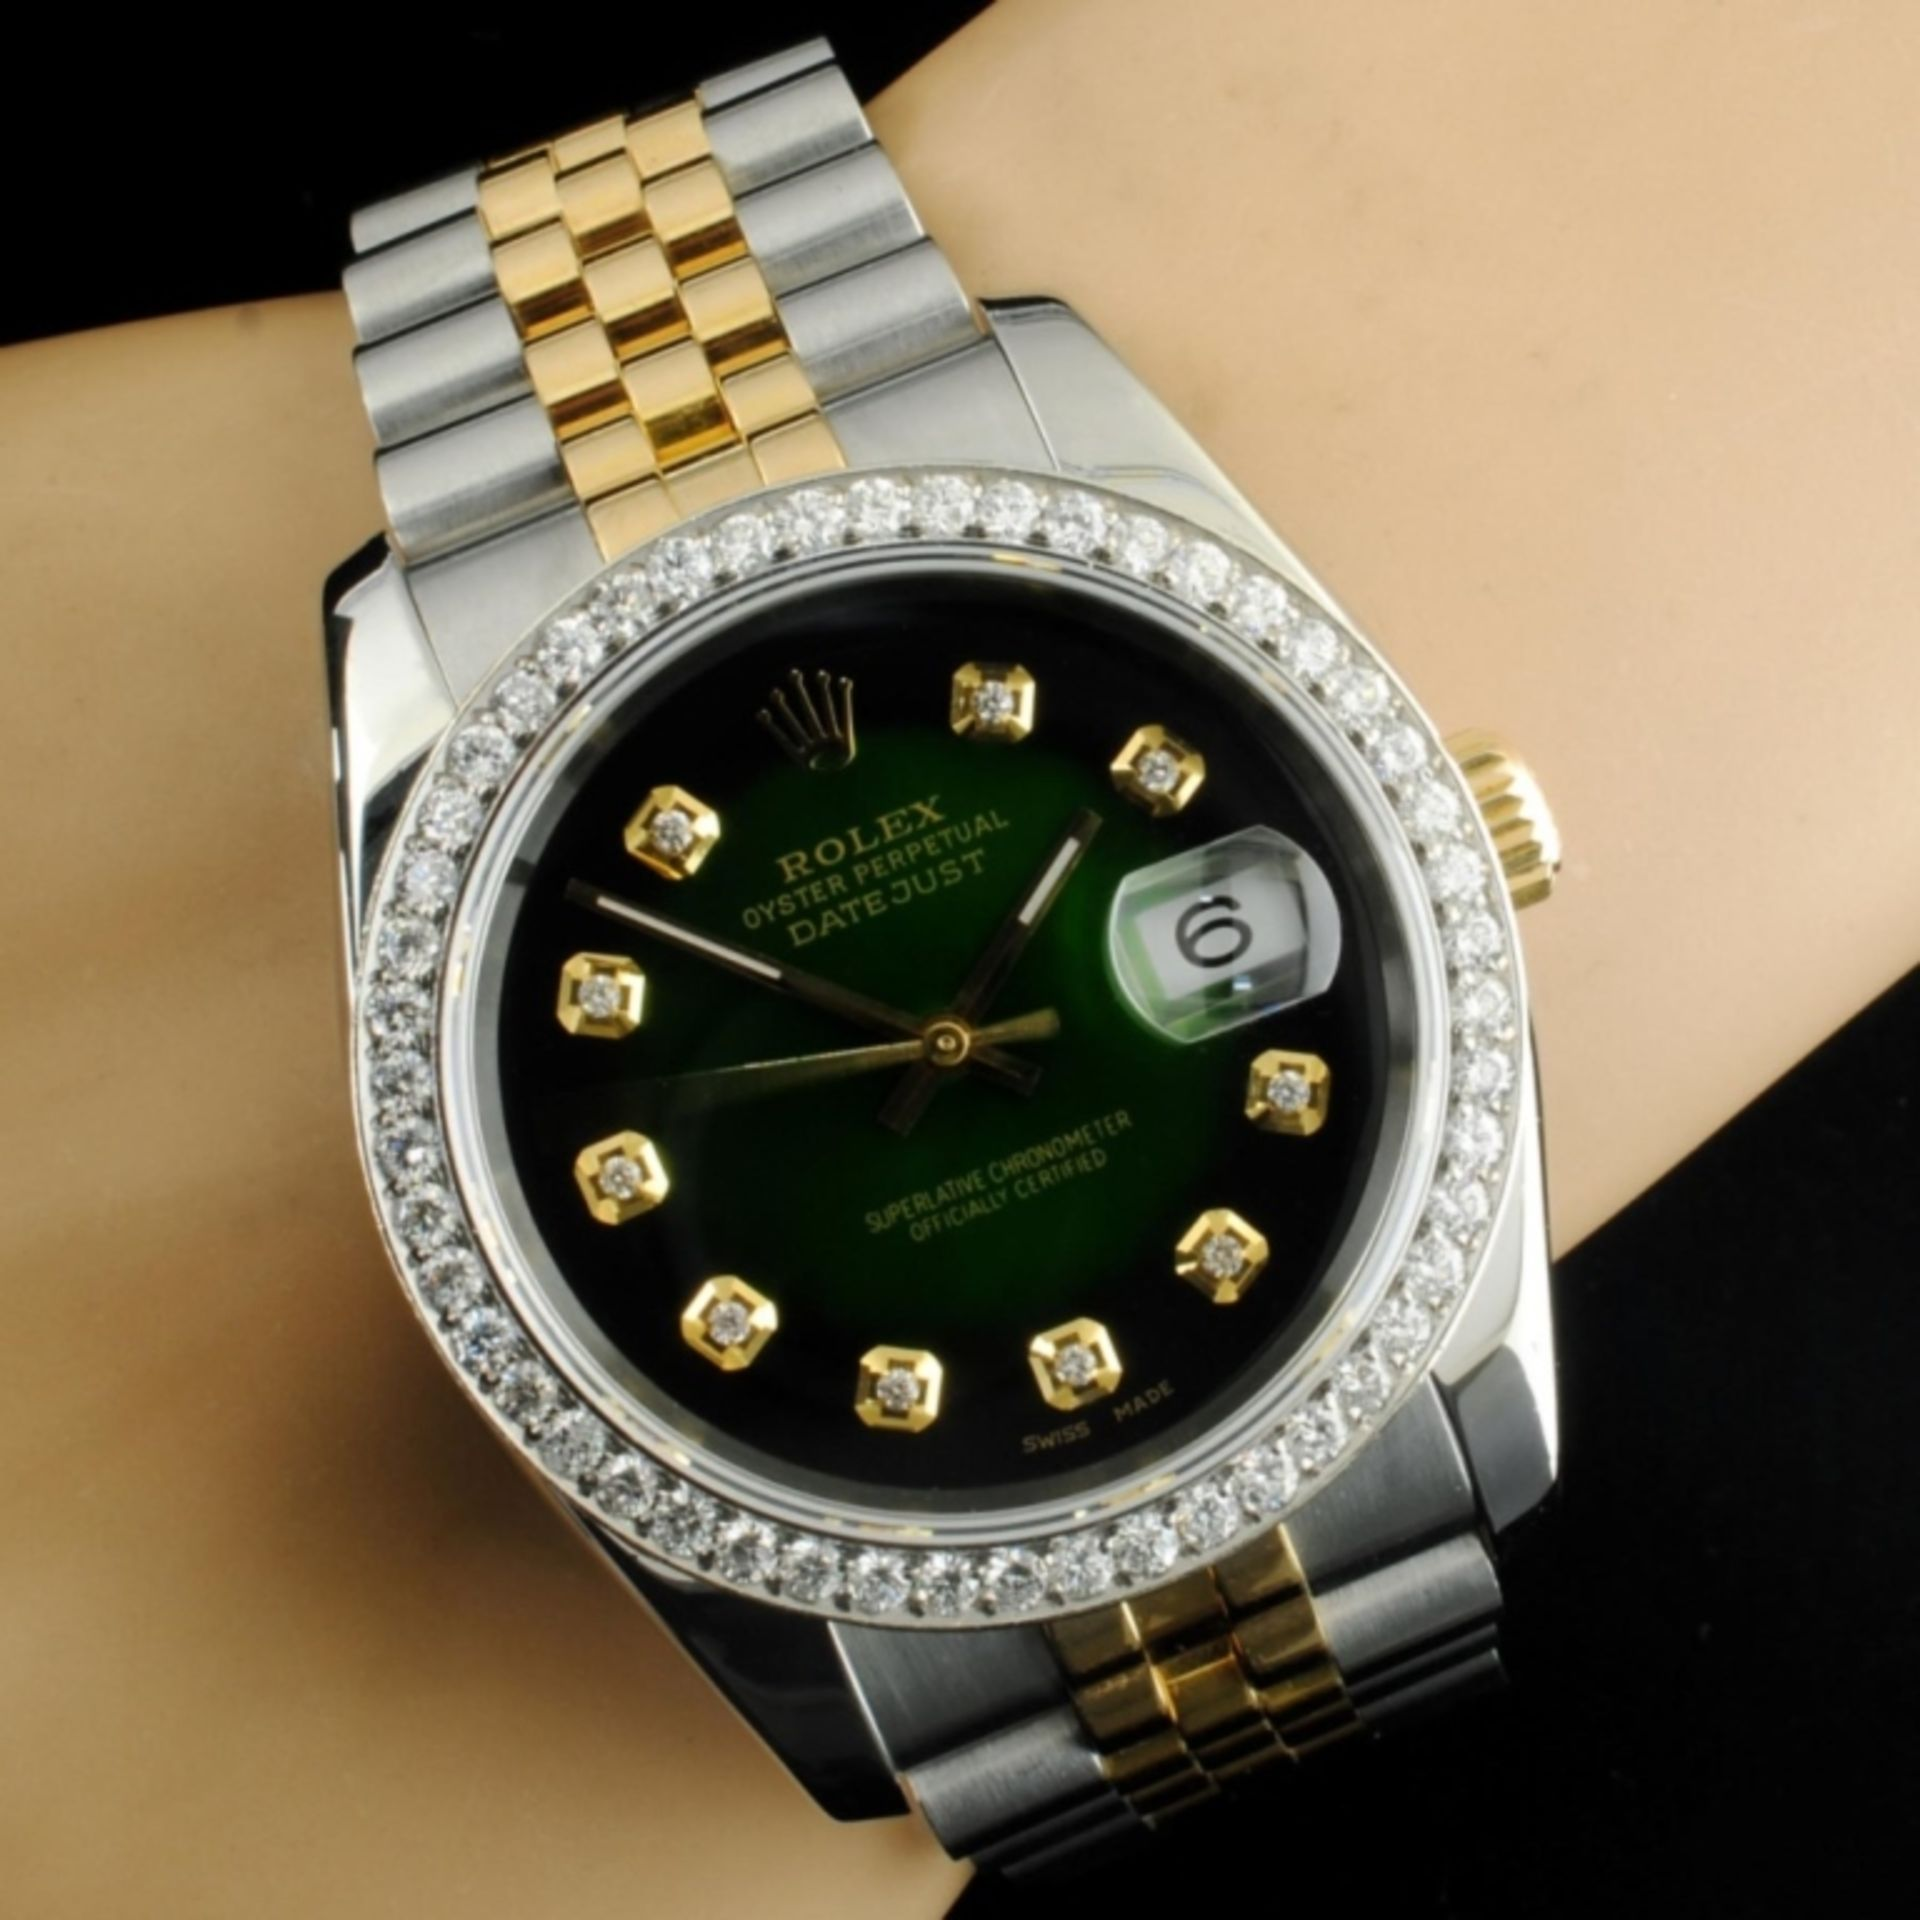 Rolex DateJust 116233 18K YG/SS Diamond 36MM Watch - Image 6 of 7